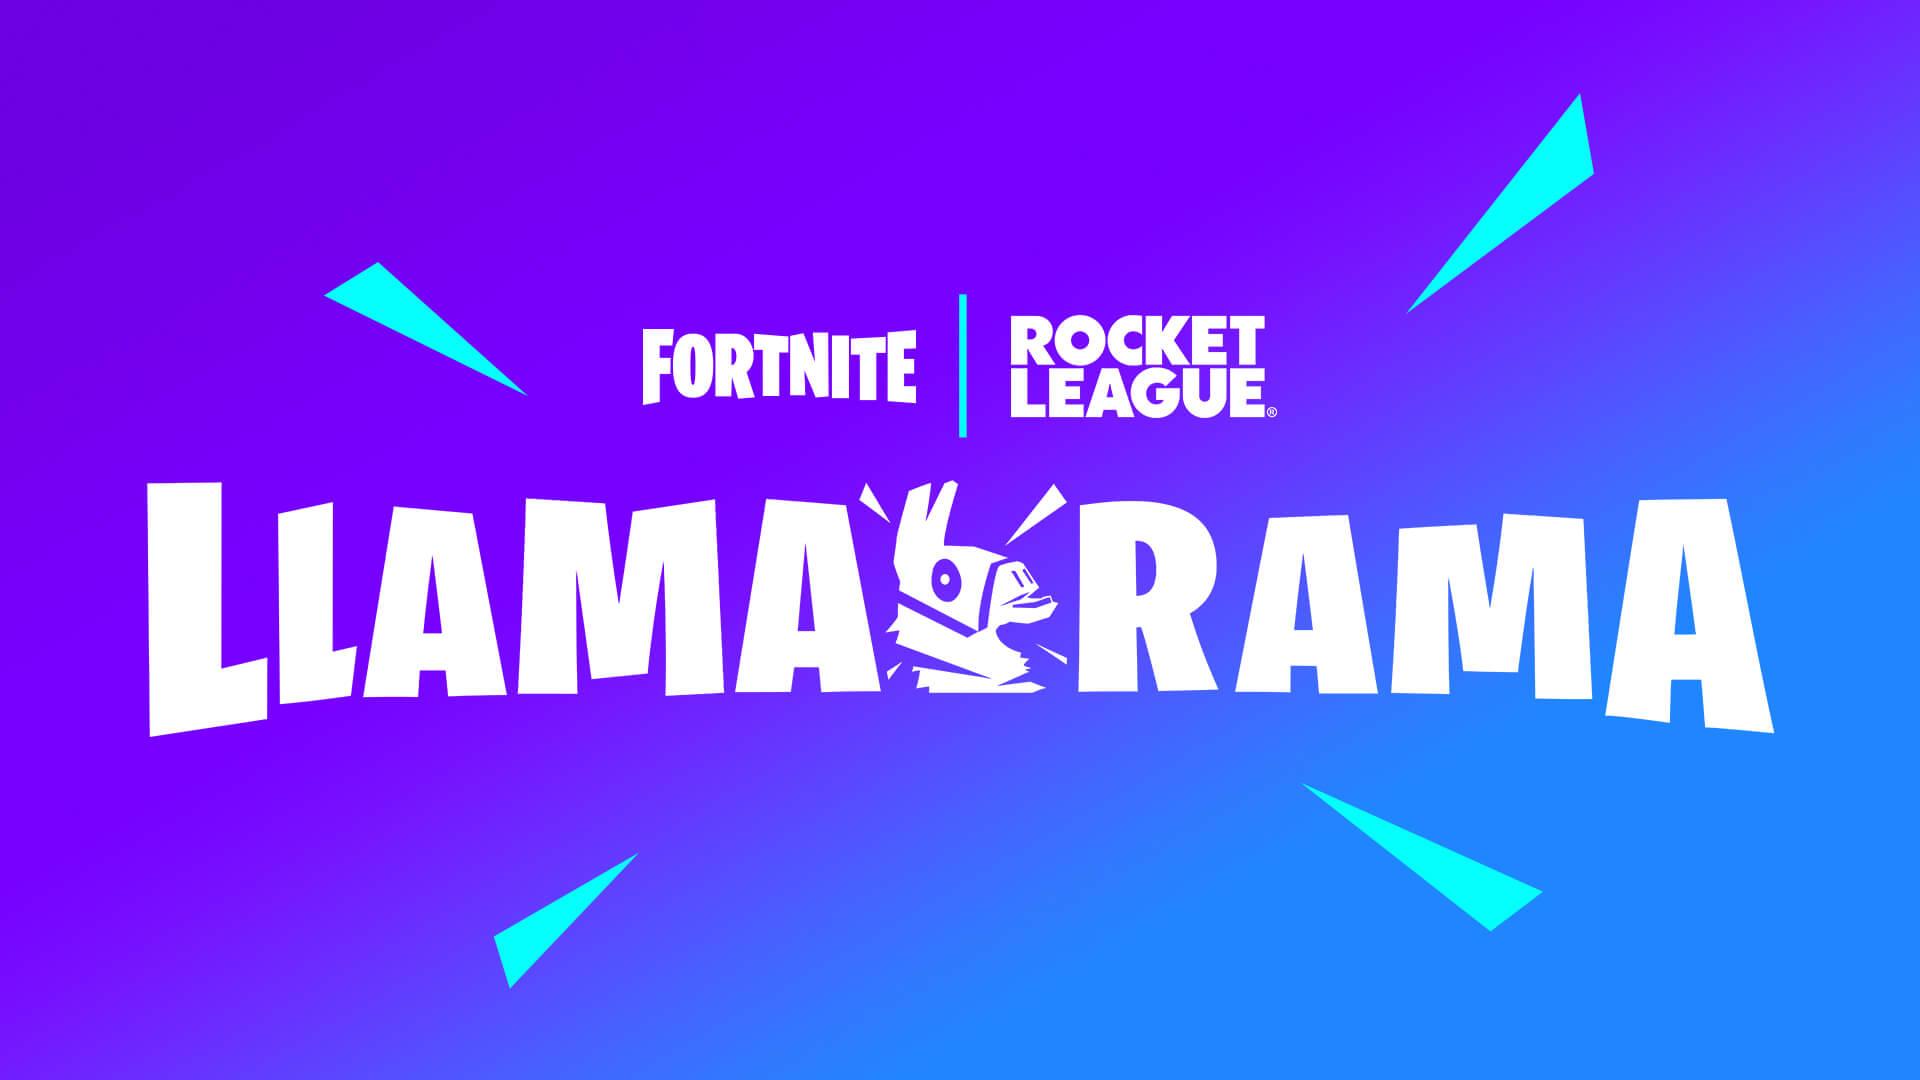 Fortnite Rocket League Llamarama Event